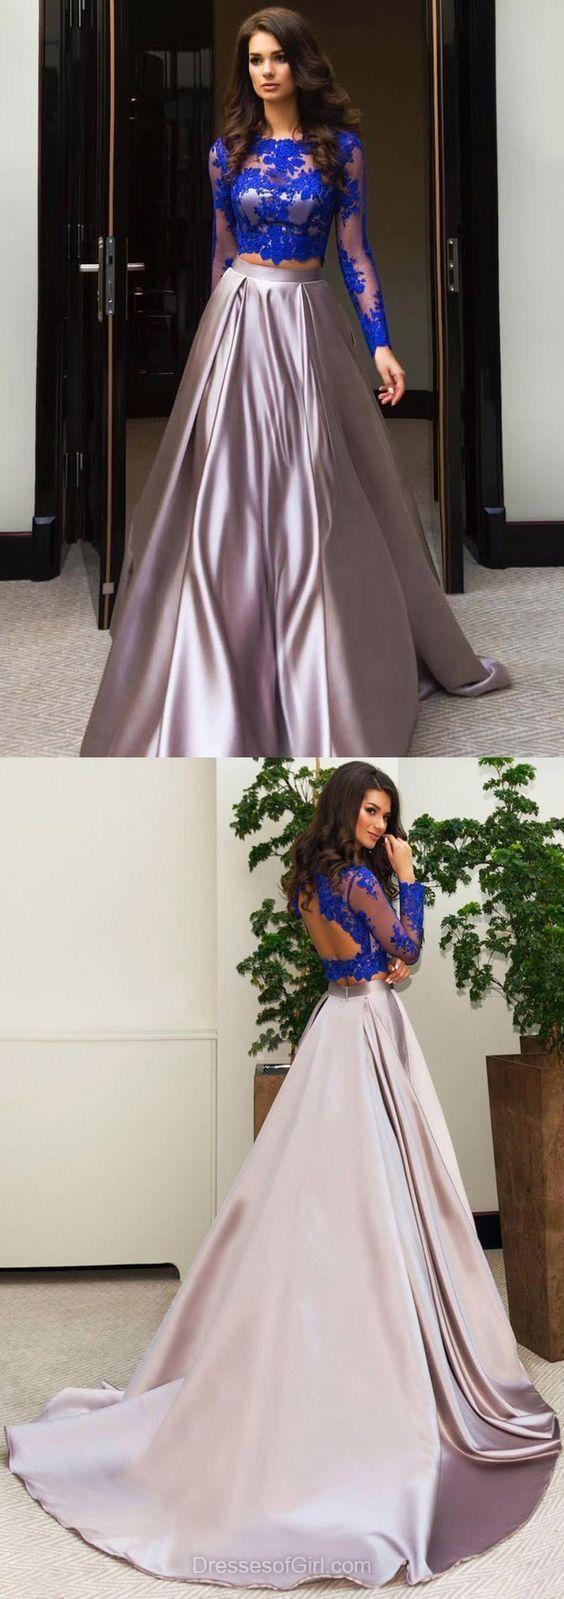 Long sleeves satin blue prom dress eastern u western dresses